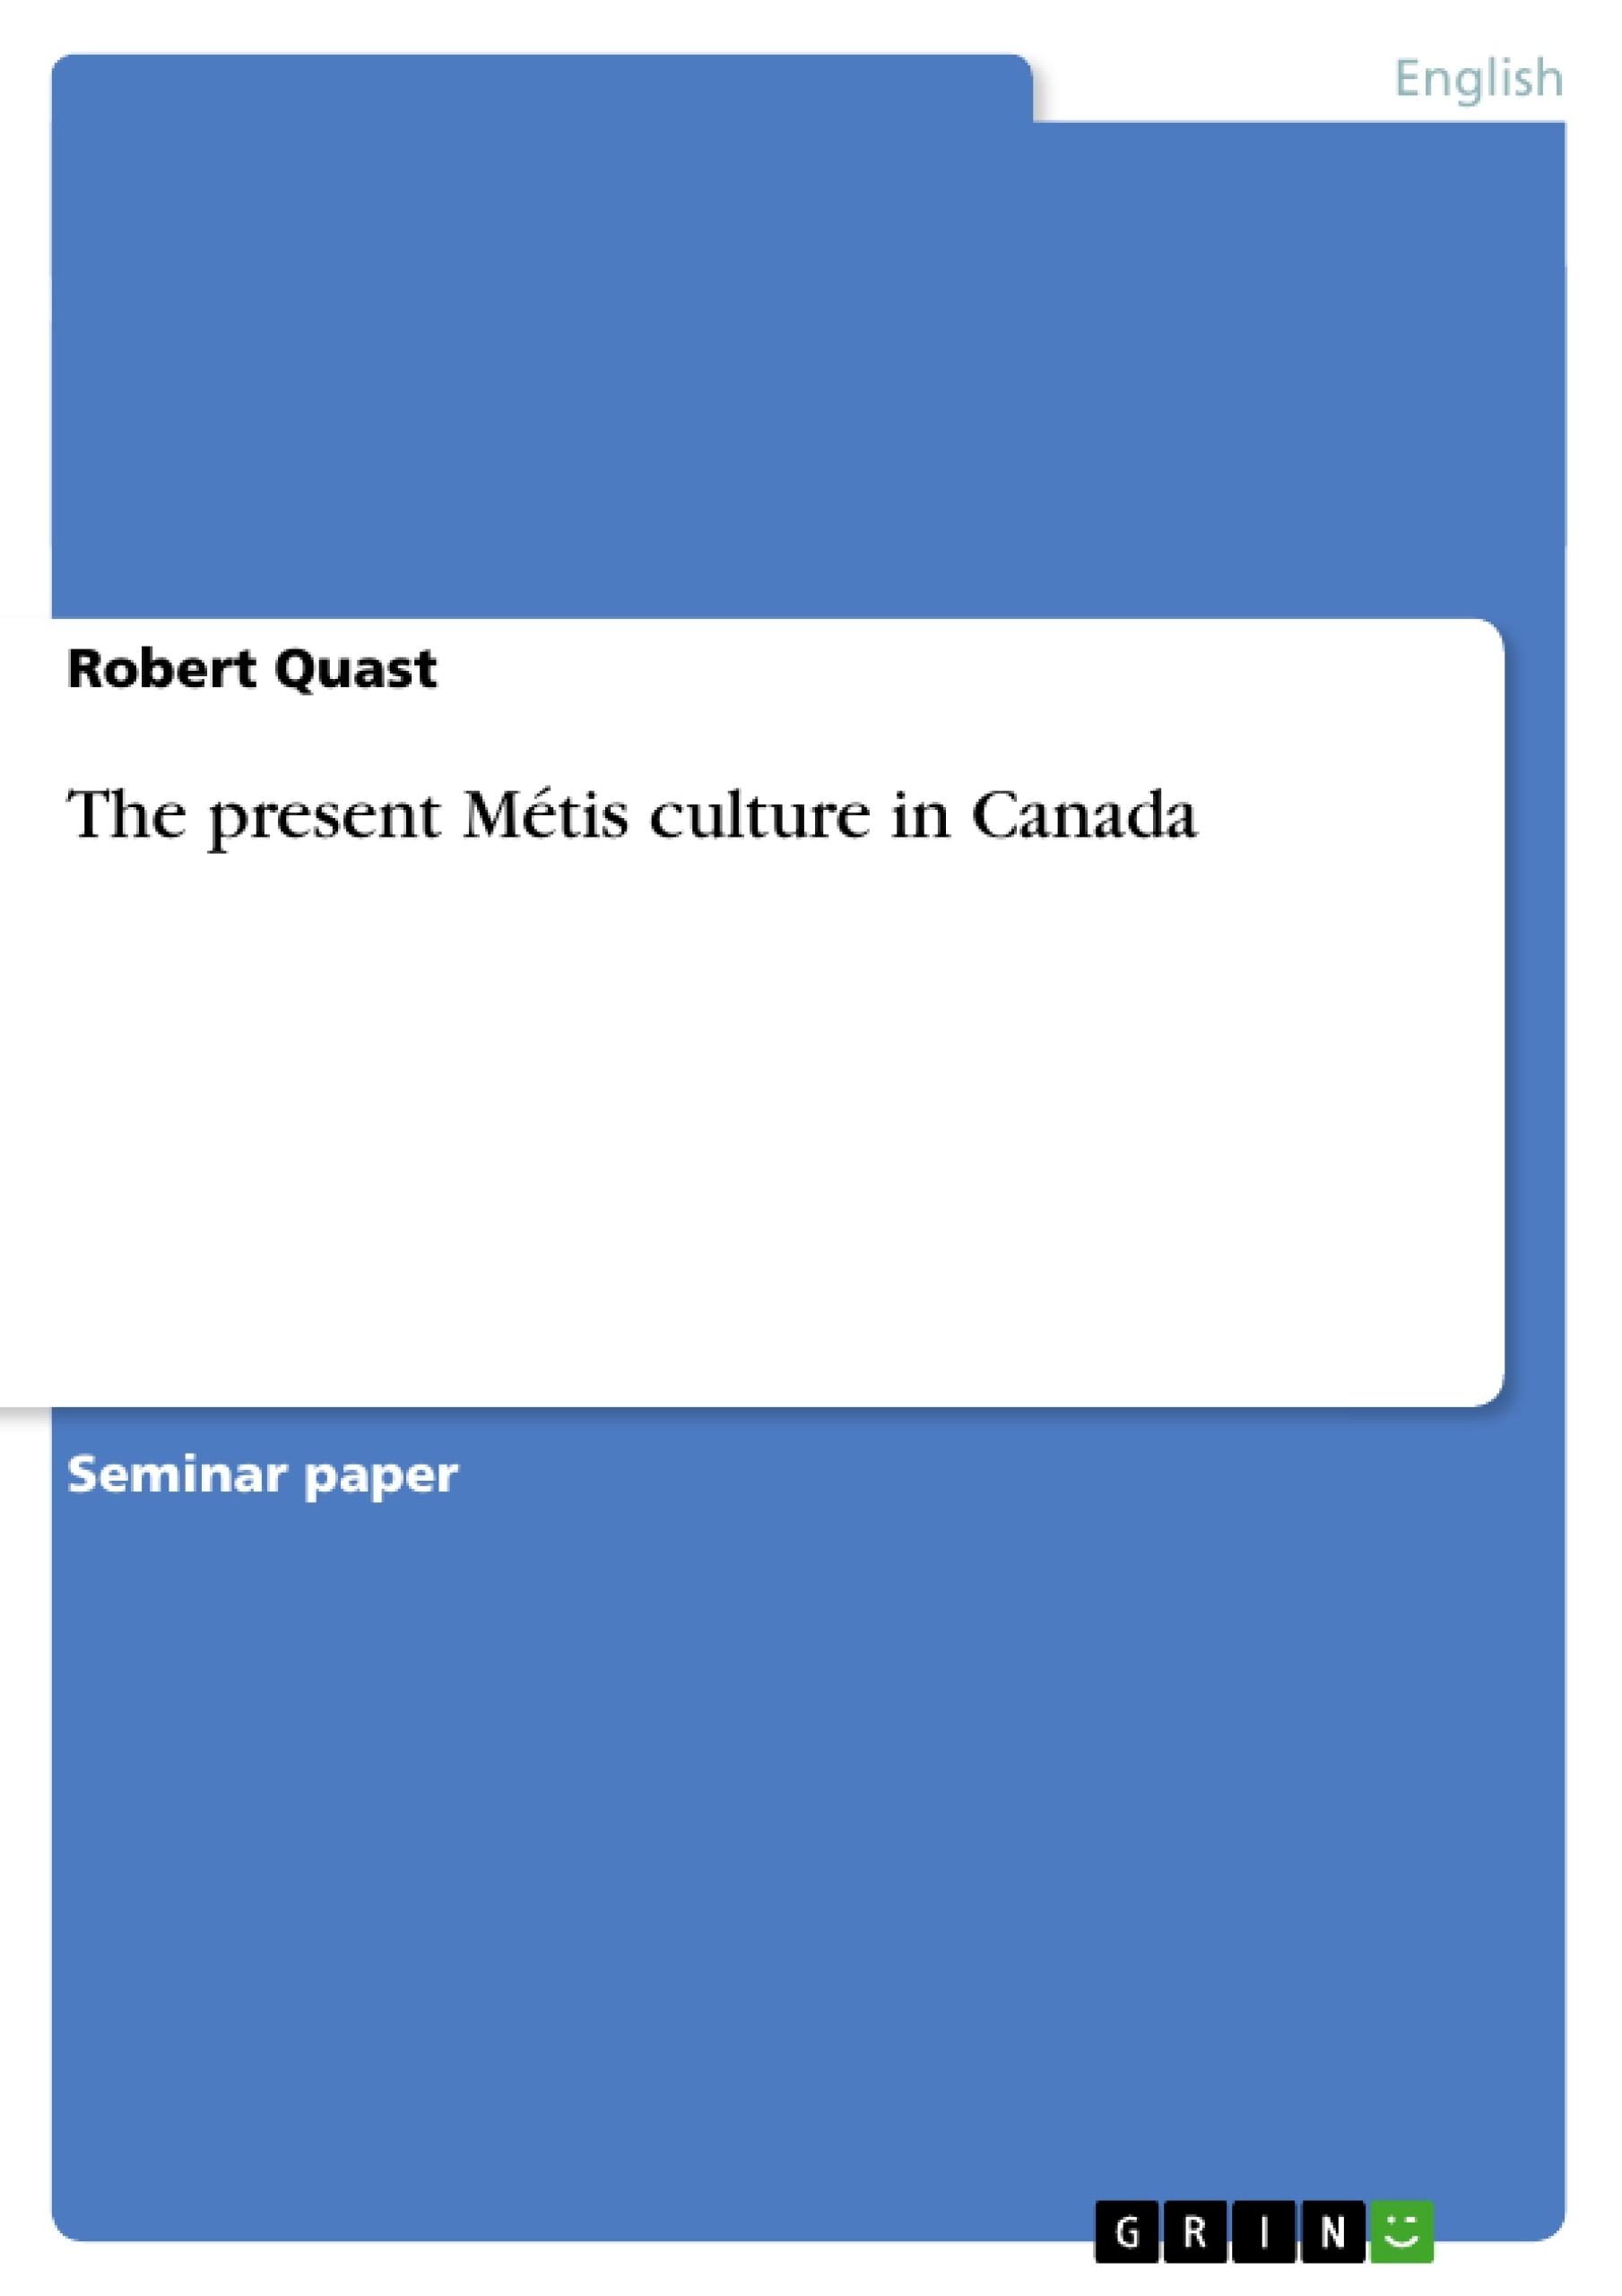 The Métis within Canada